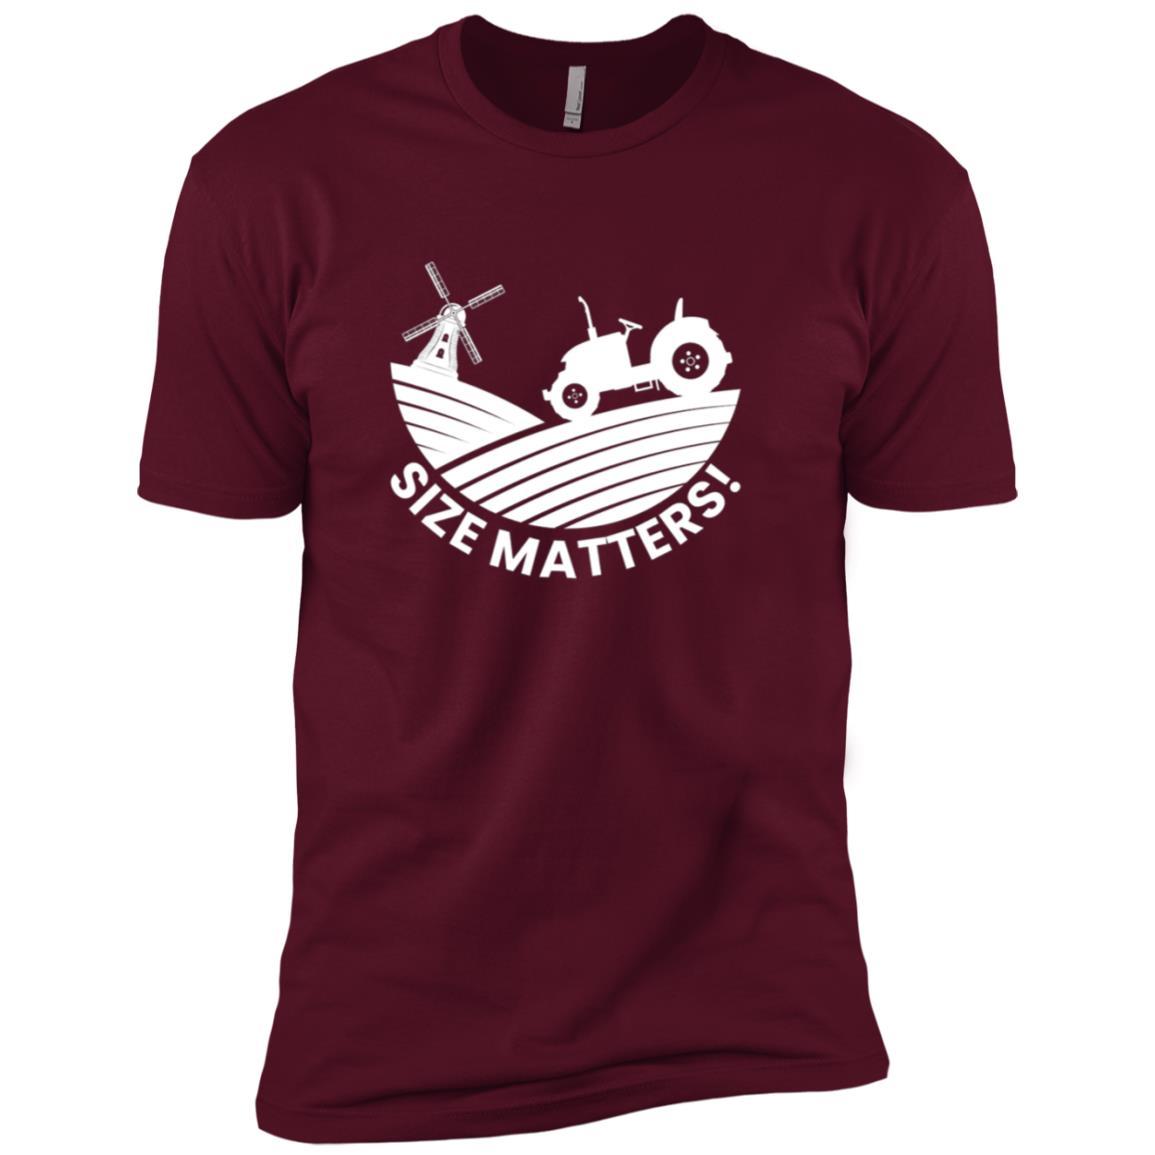 Tractor Size Matters Big Wheels Windmill Funny Gift Men Short Sleeve T-Shirt